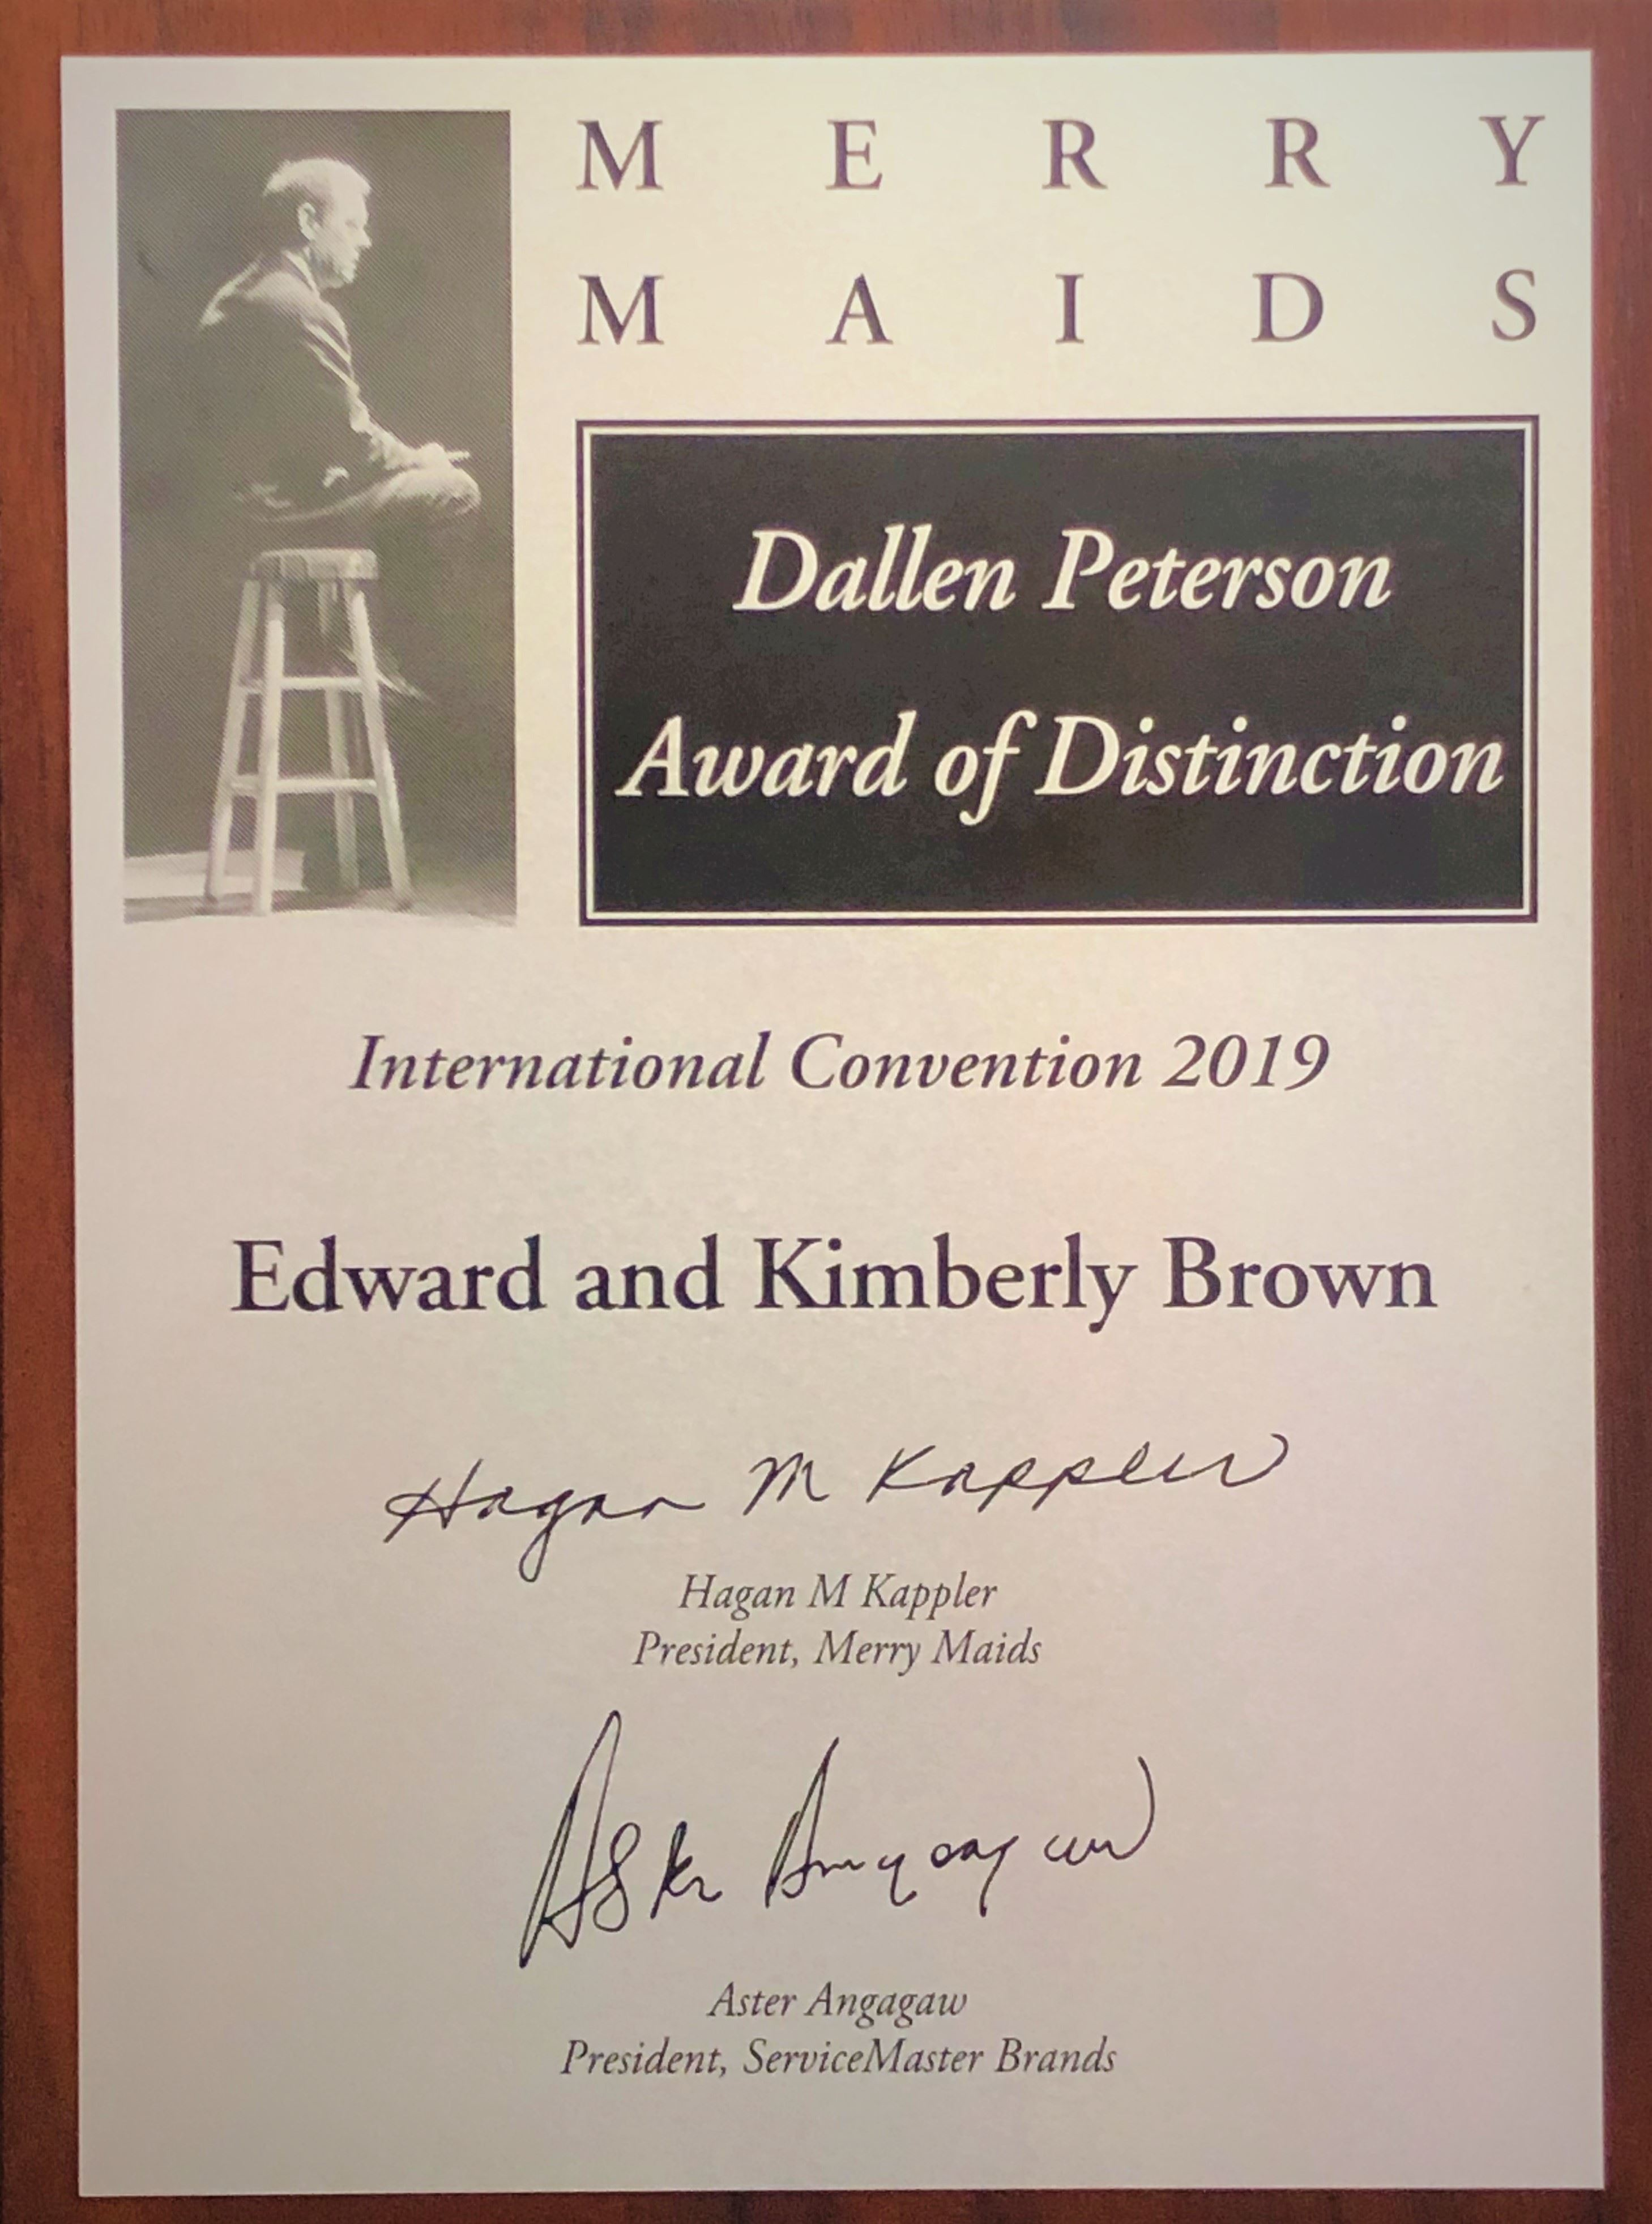 Dallen Peterson Award of Distinction